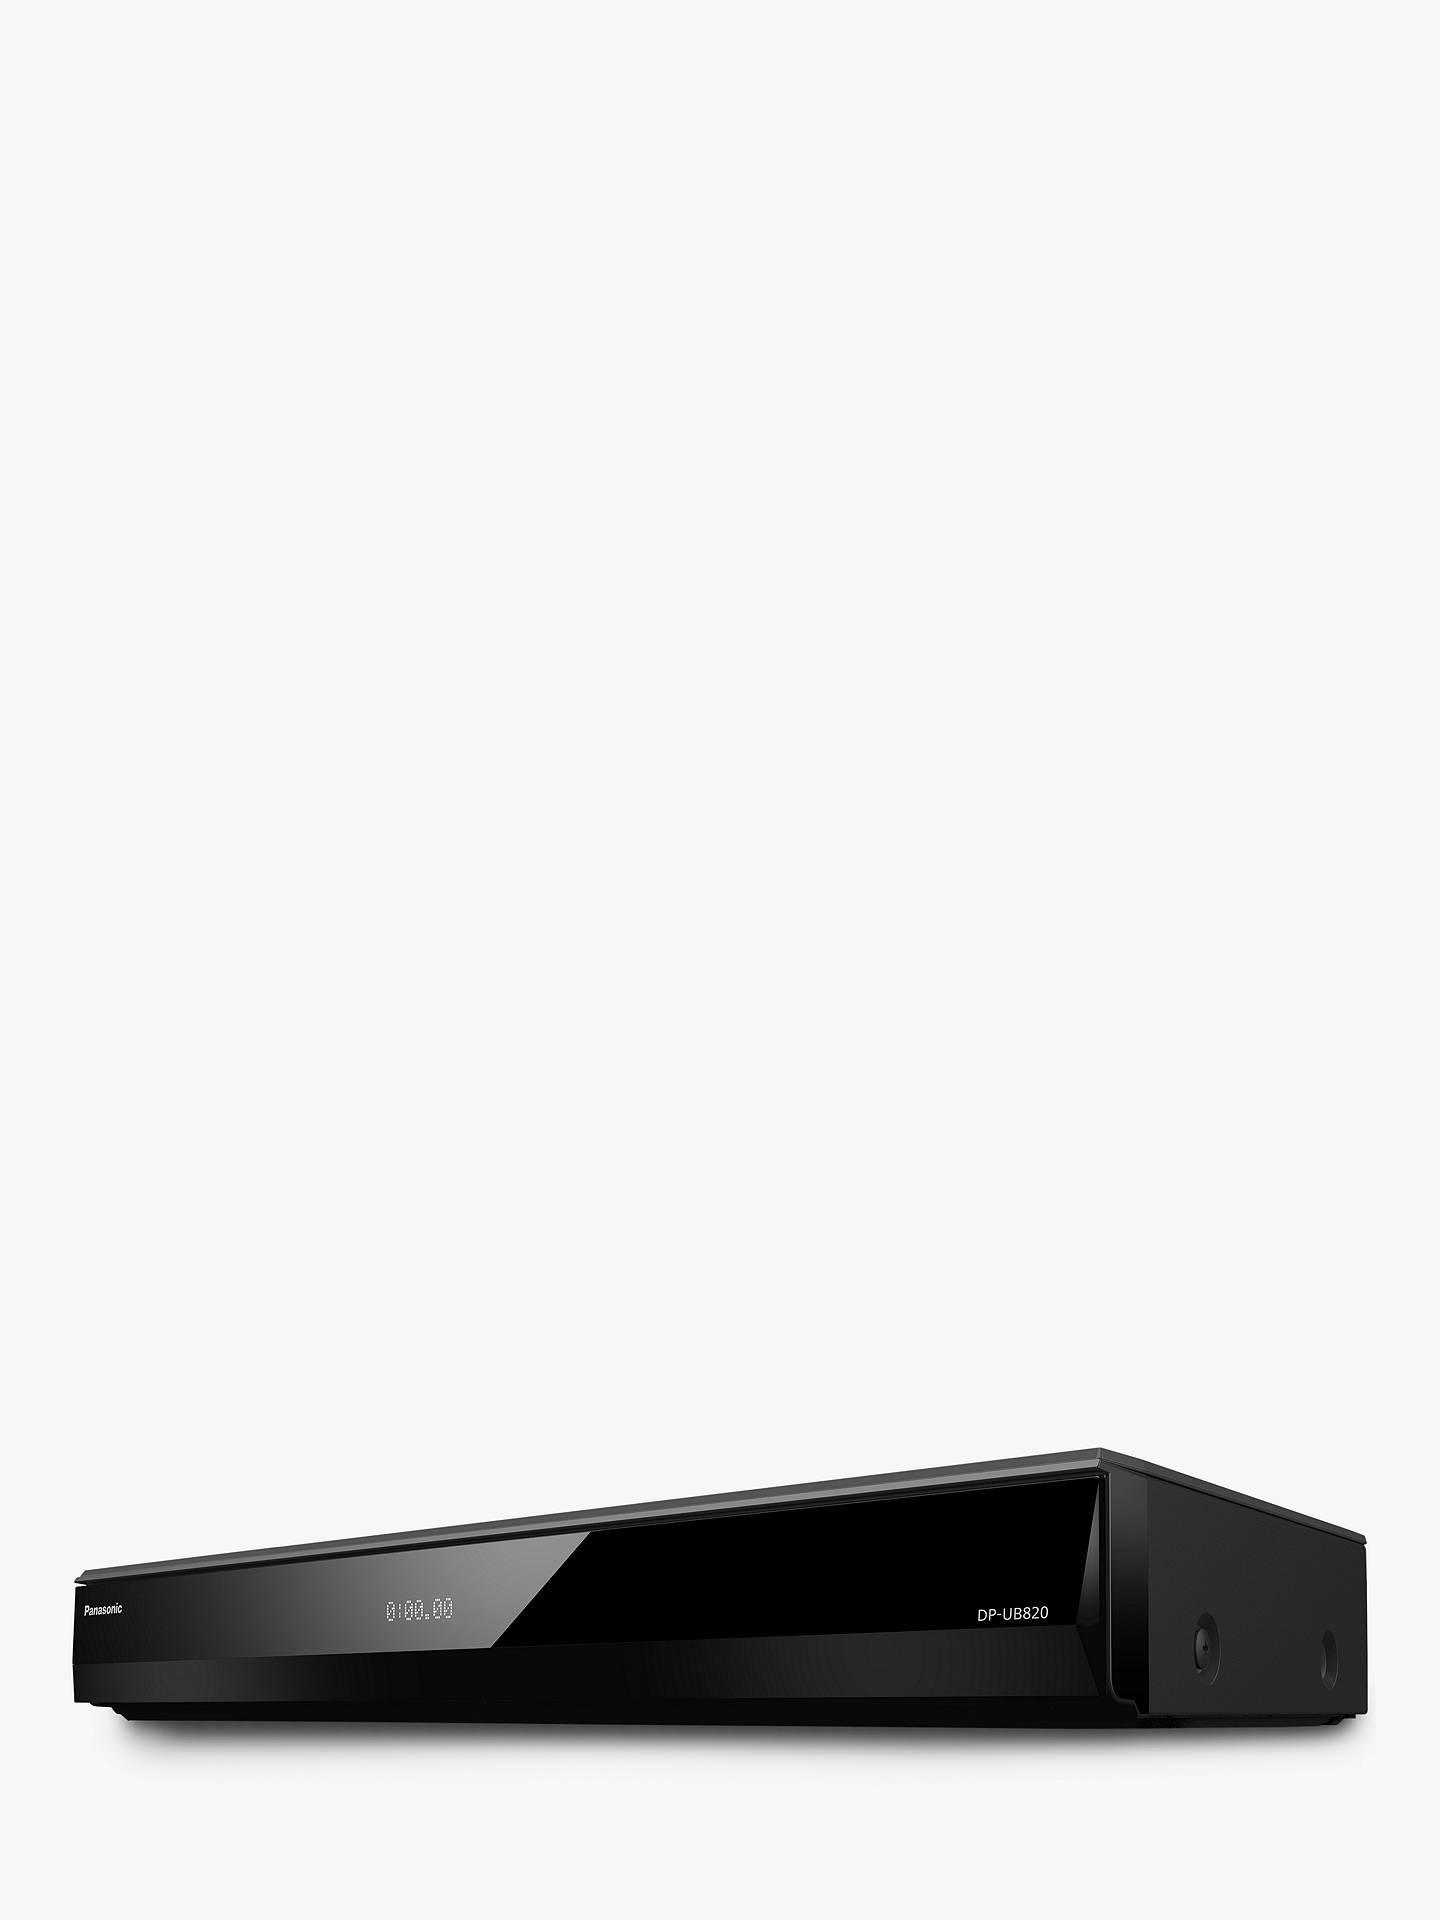 Panasonic DP-UB820EBK Smart 3D 4K UHD HDR Upscaling Blu-Ray/DVD Player with  High Resolution Audio, Ultra HD Premium Certified